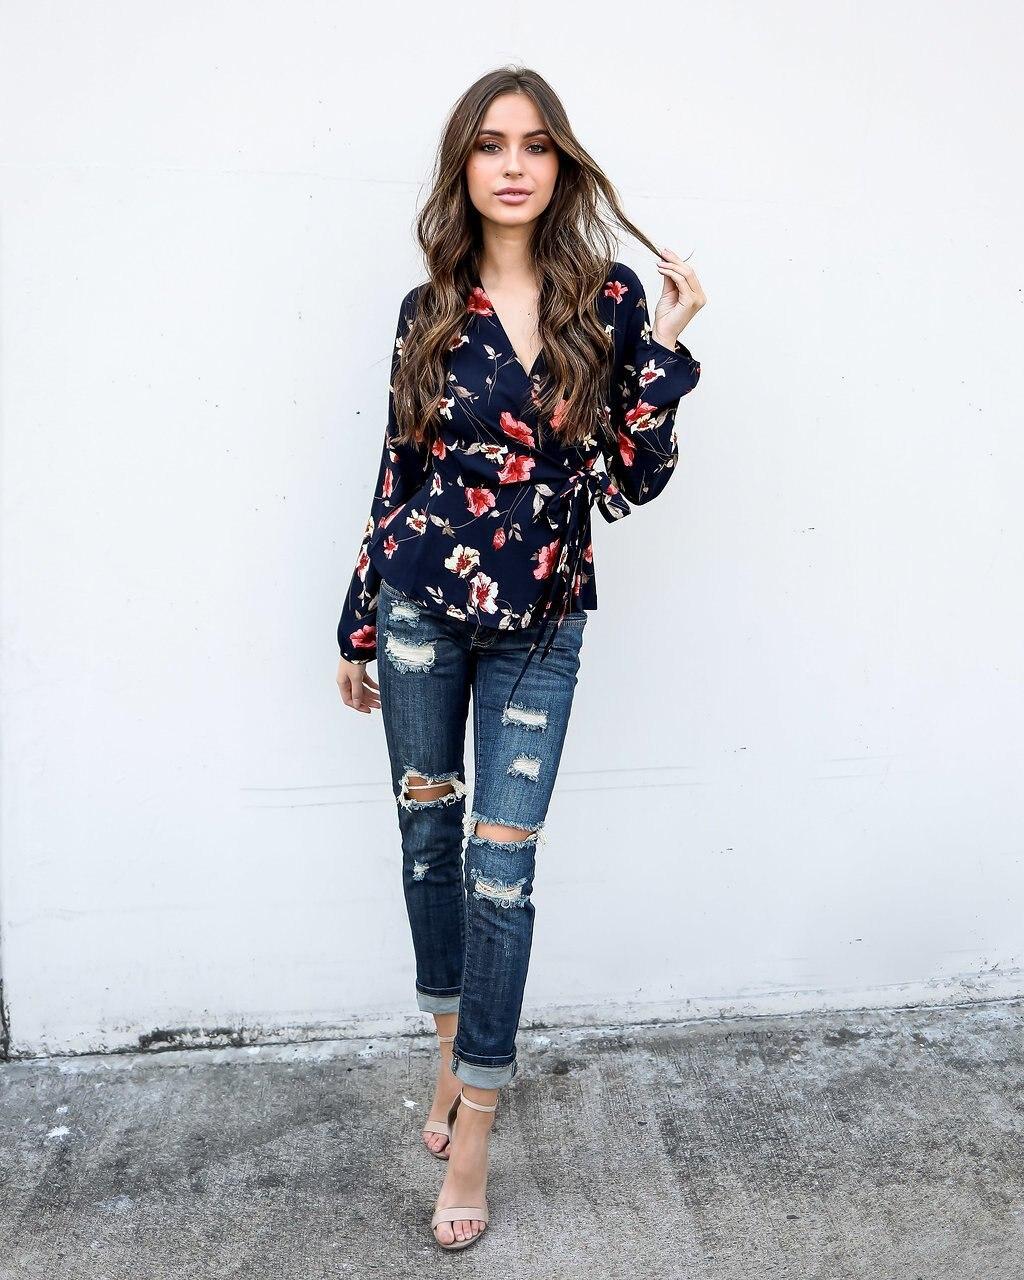 women blouse fashion 2020  female womens top shirt ladies floral festivals sexy  fashion 2020   elegance clothing top 90s